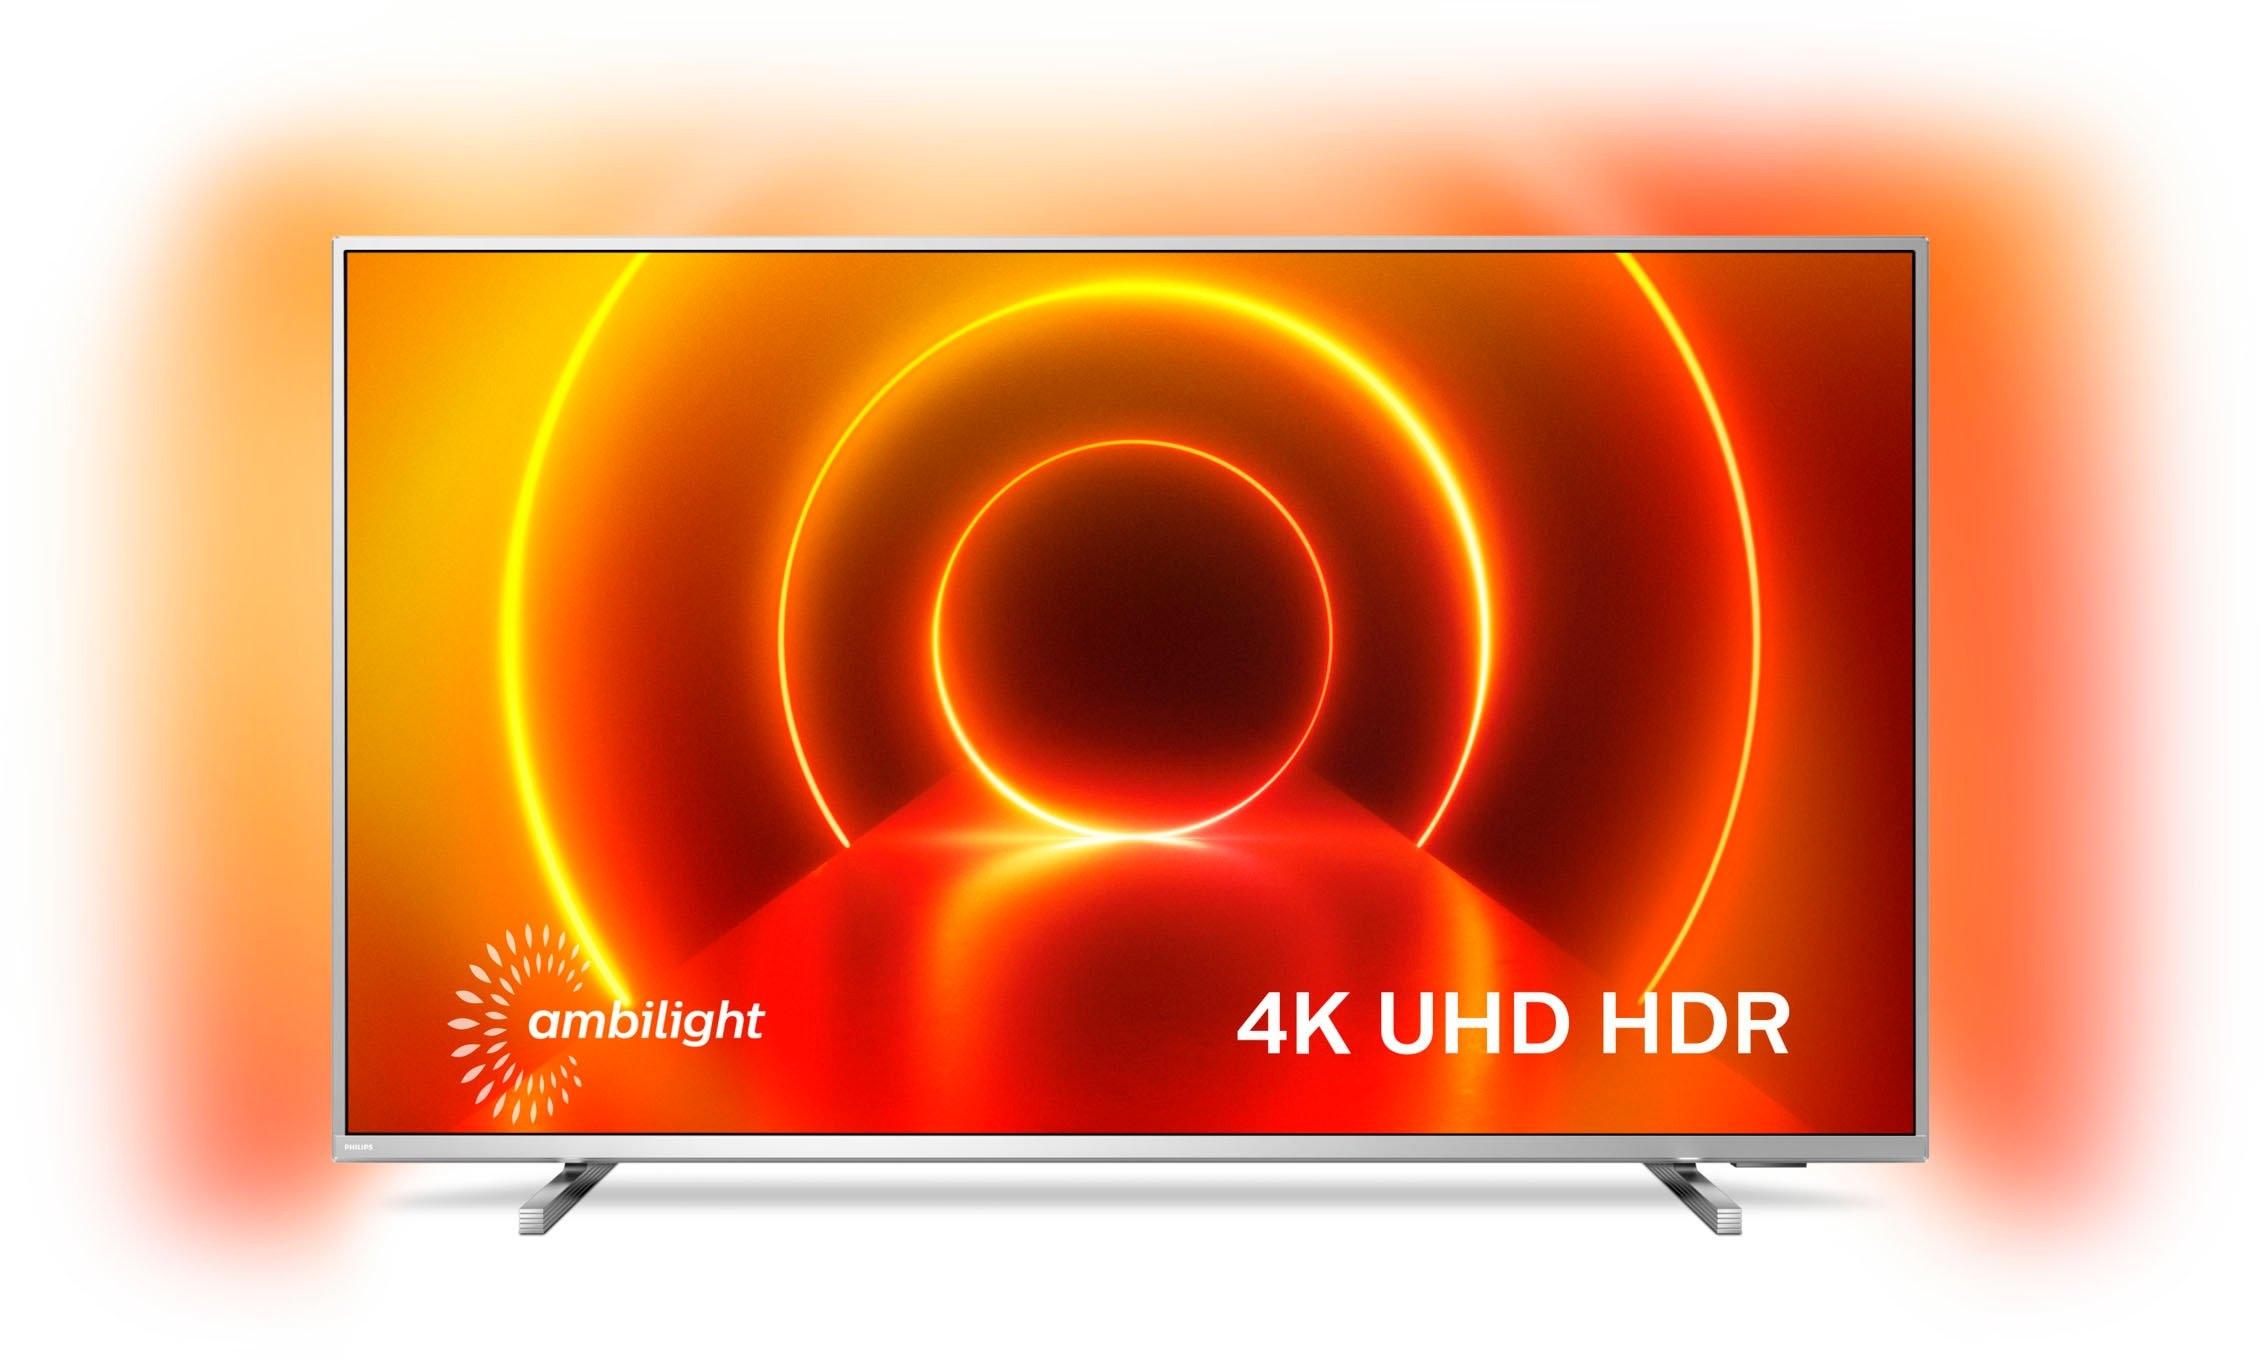 Philips »58PUS8105« LED-TV - verschillende betaalmethodes